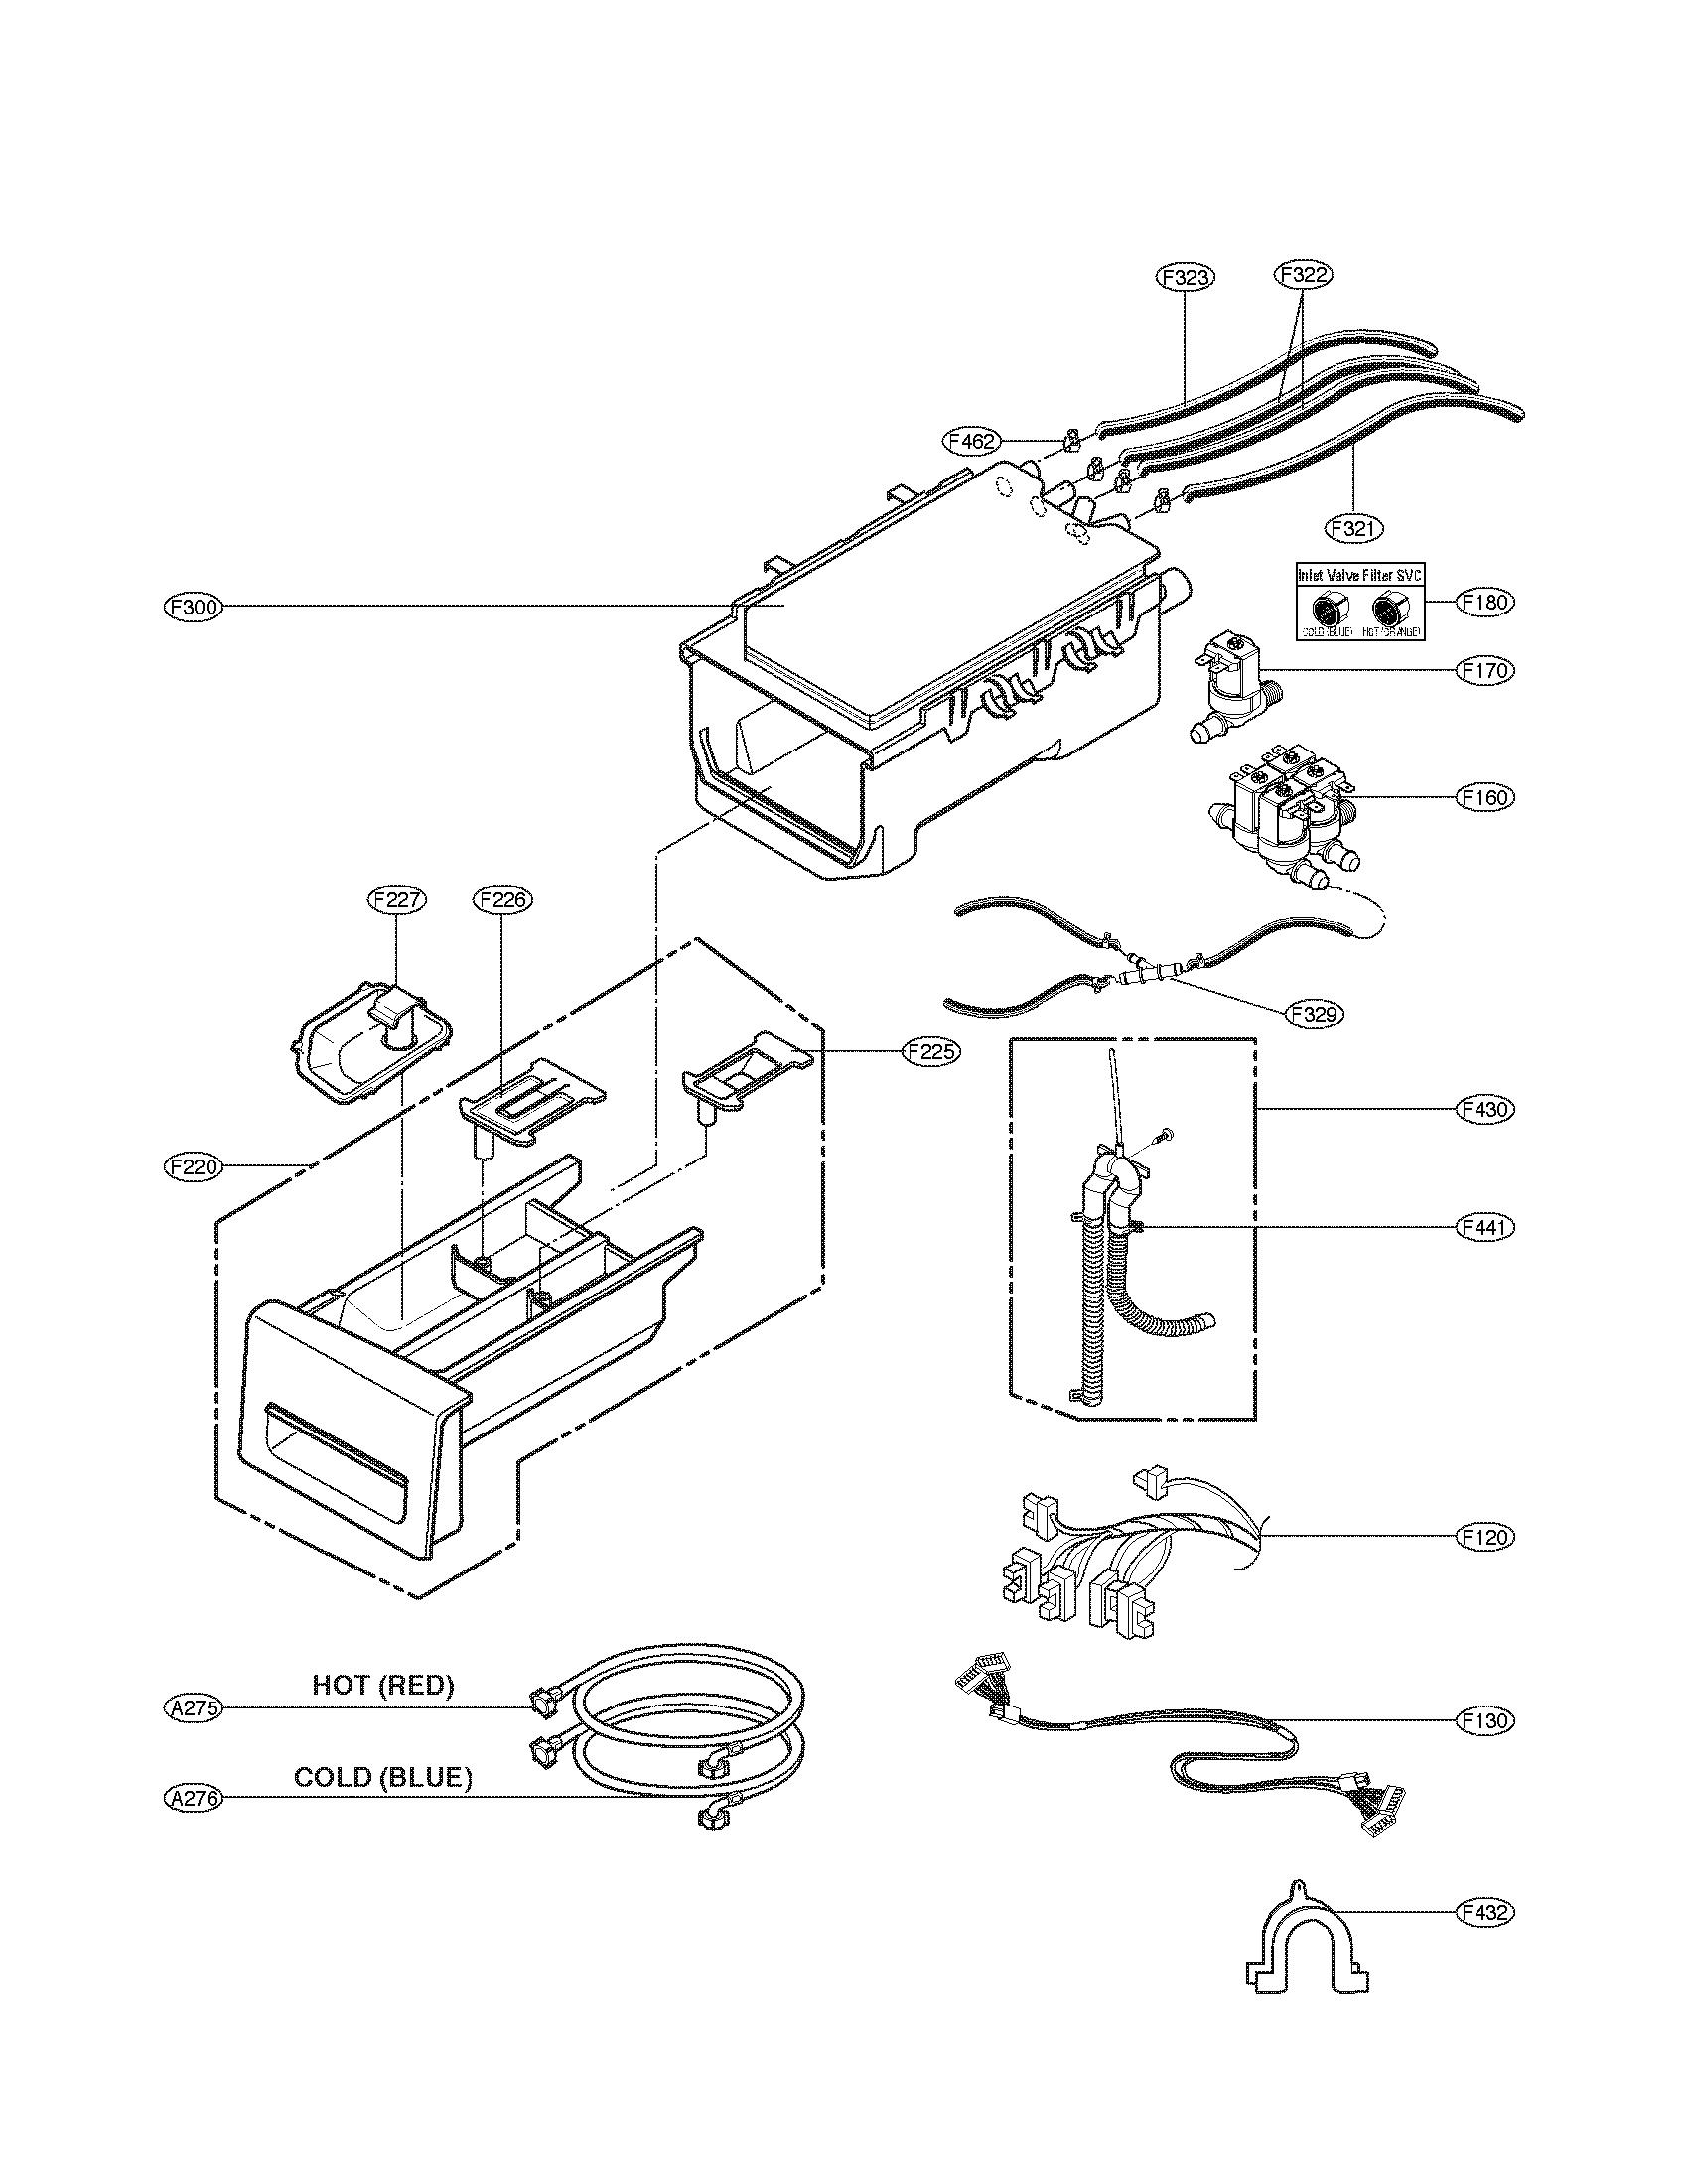 Pin on LG Washer Repair